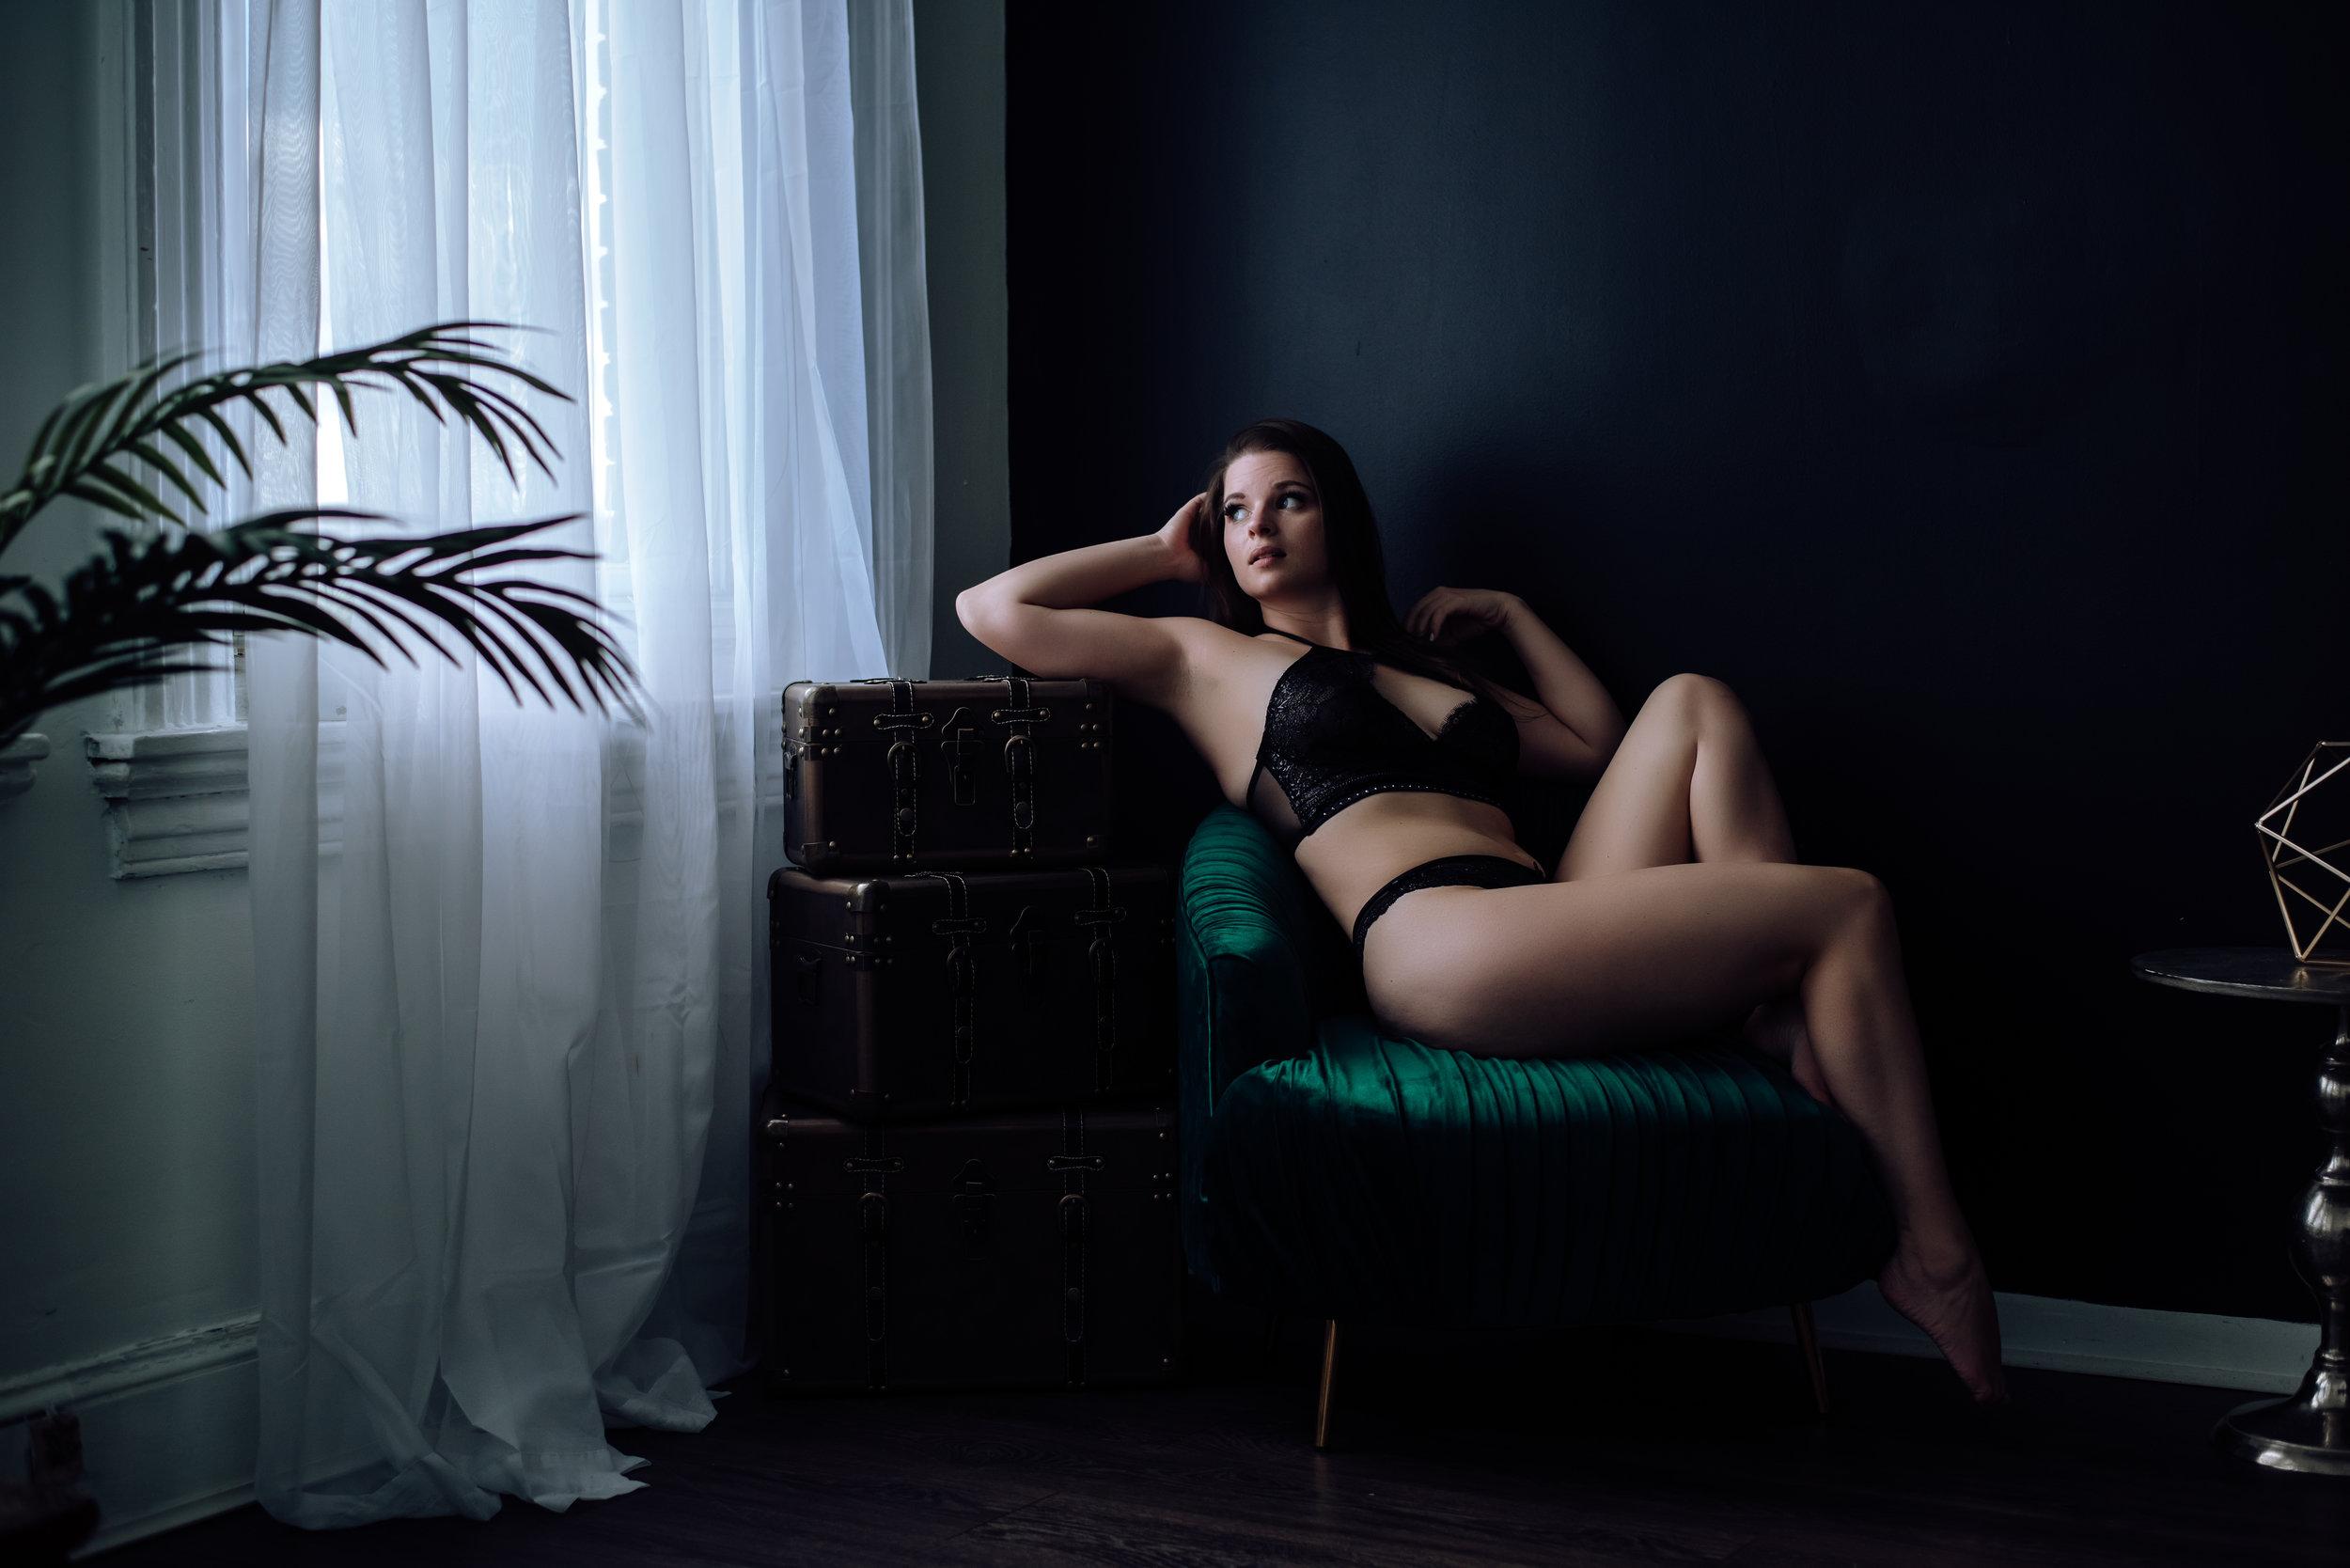 boudoir-photography-best-in-berks-11.jpg